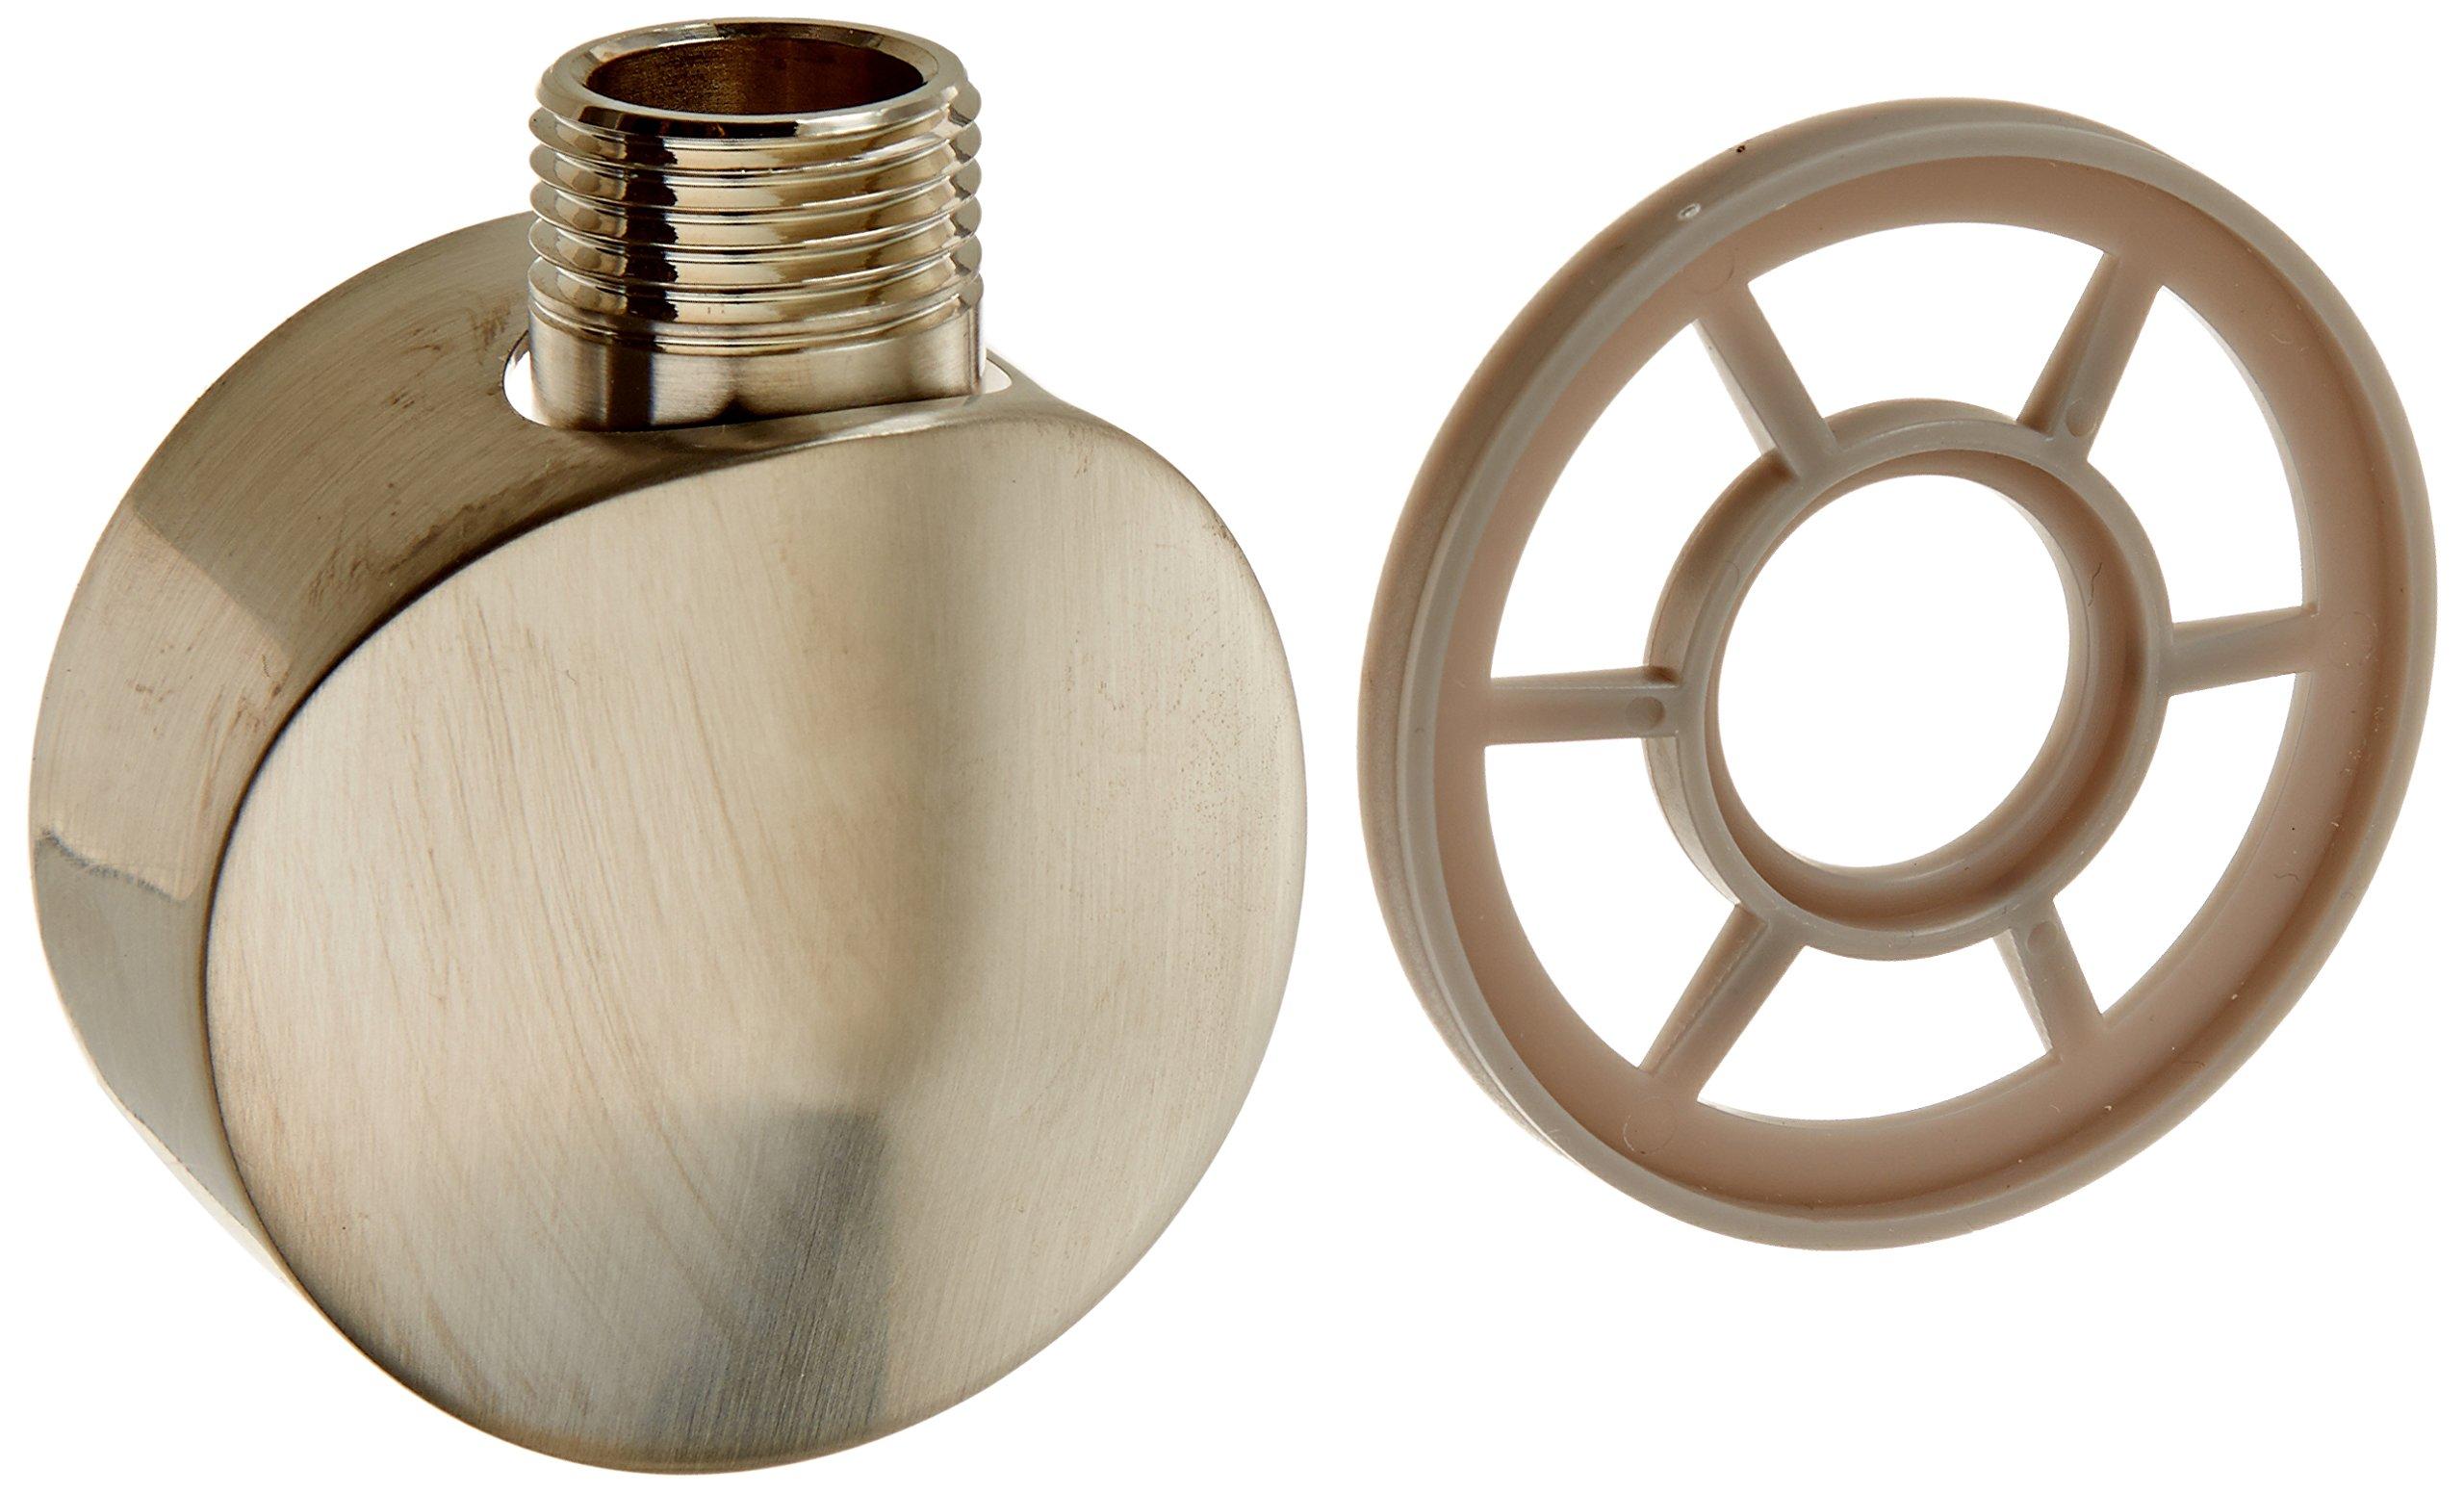 Jaclo 6401-SN Luxury Water Supply Elbow, Satin Nickel